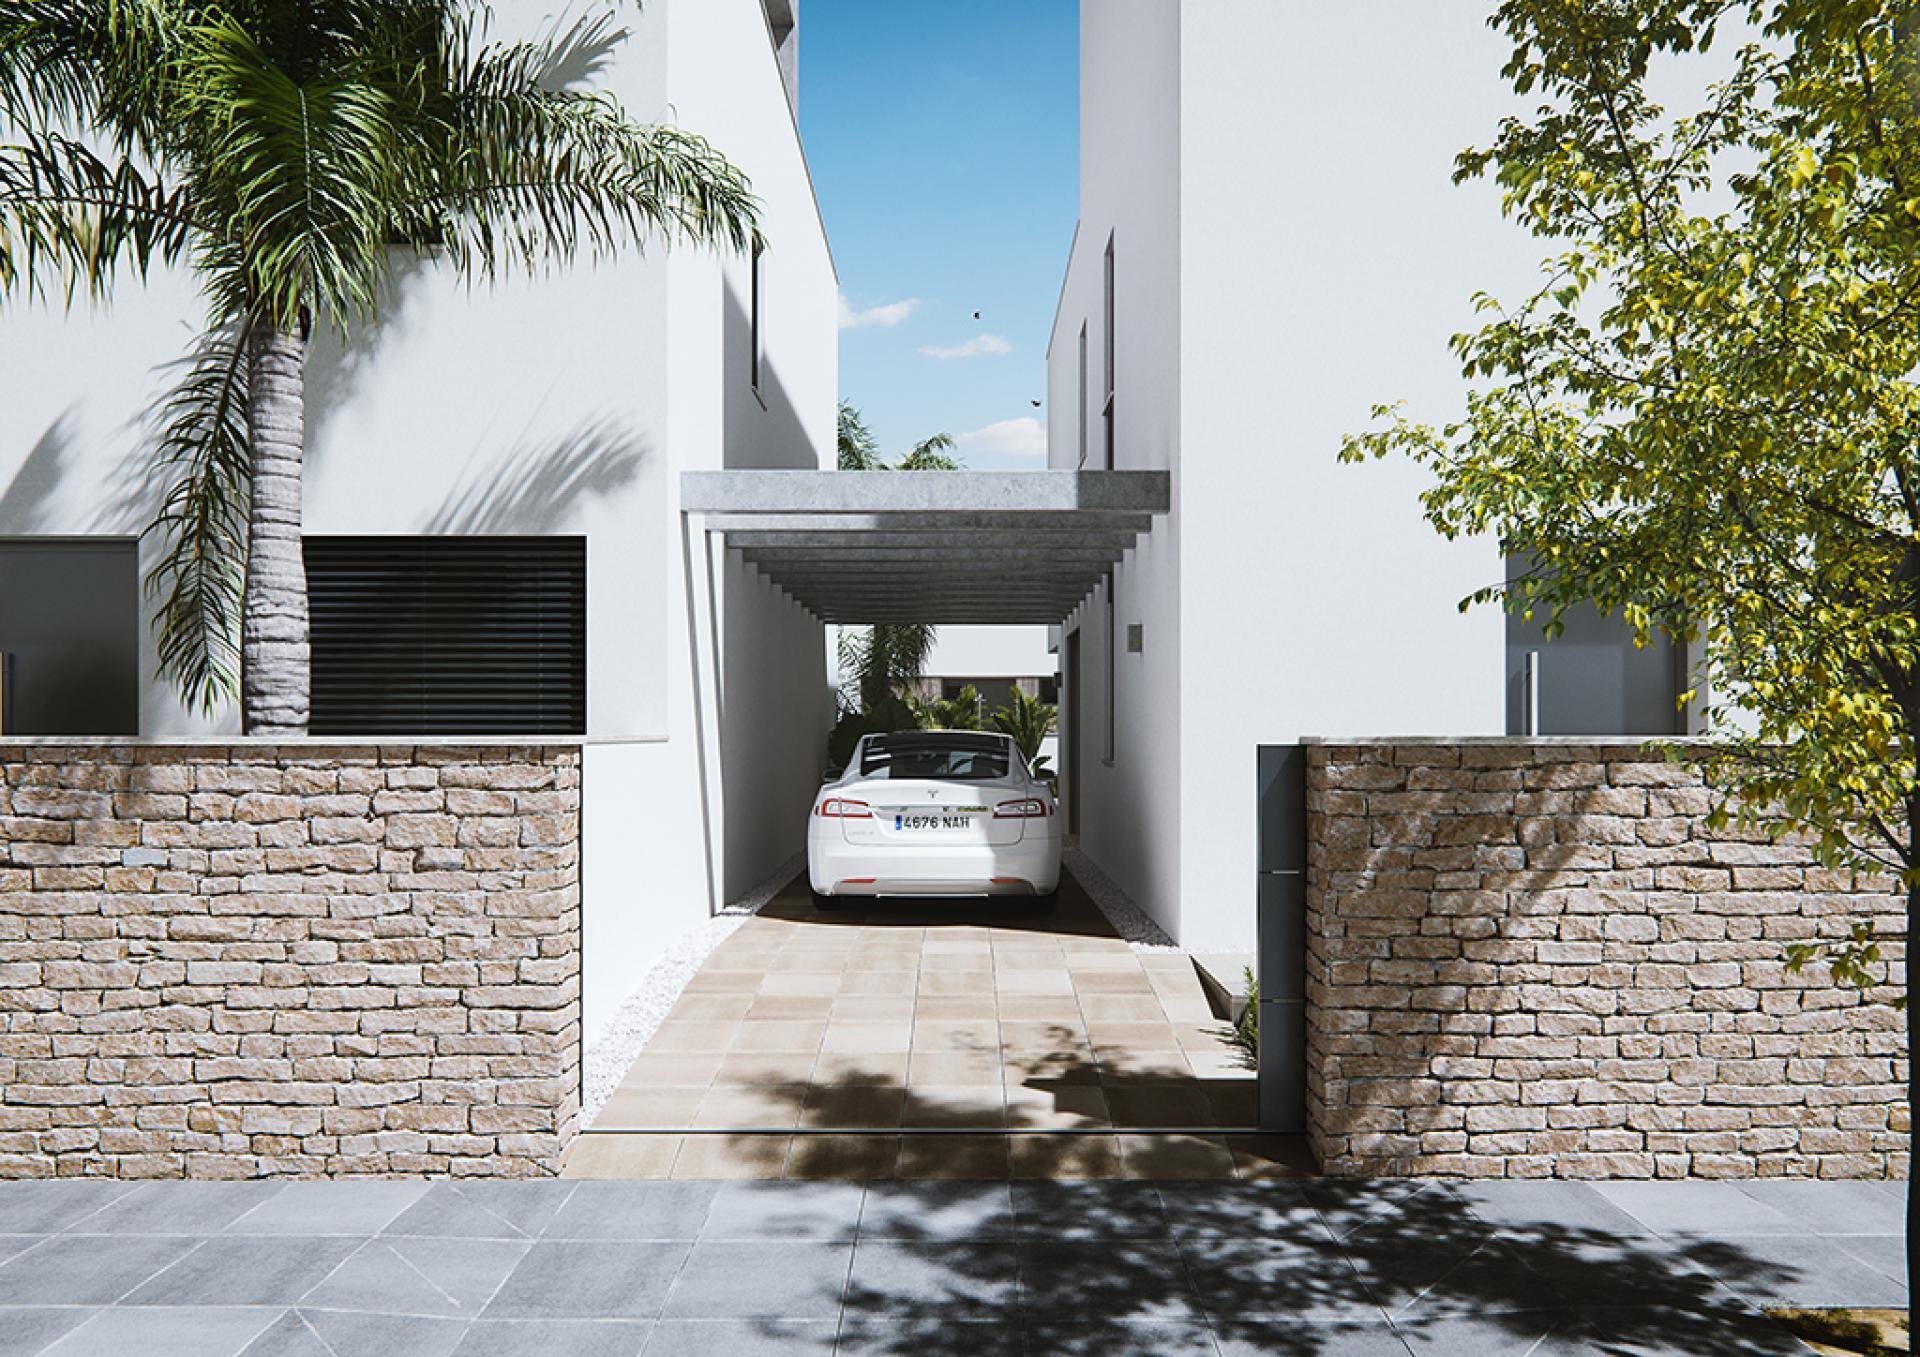 Luxe villa nabij het strand, Torre de la Horadada, Alicante, Costa Blanca Zuid in Medvilla Spanje